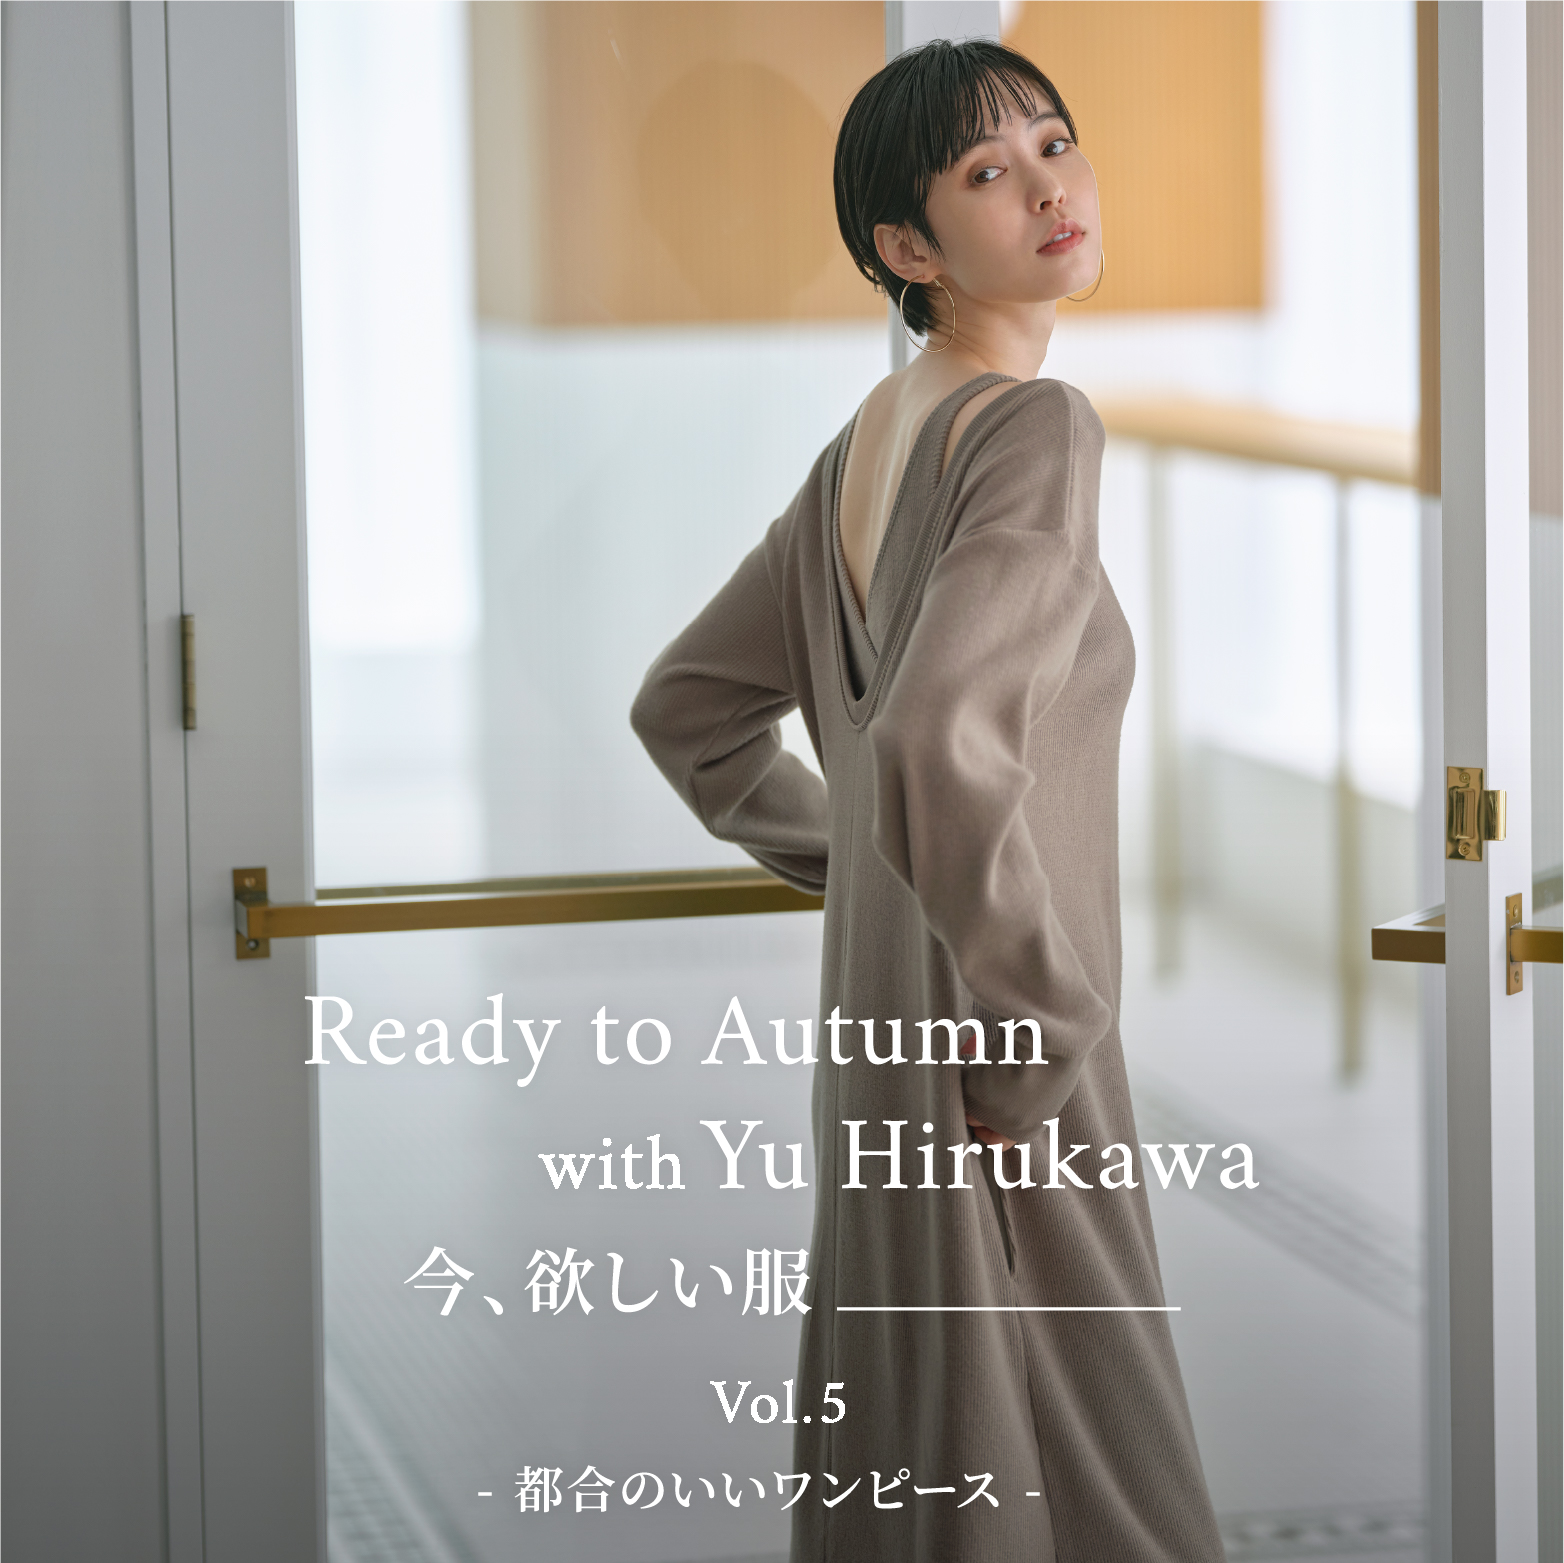 Ready to Autumn with Yu Hirukawa 今、欲しい服 Vol.5 - 都合のいいワンピース -